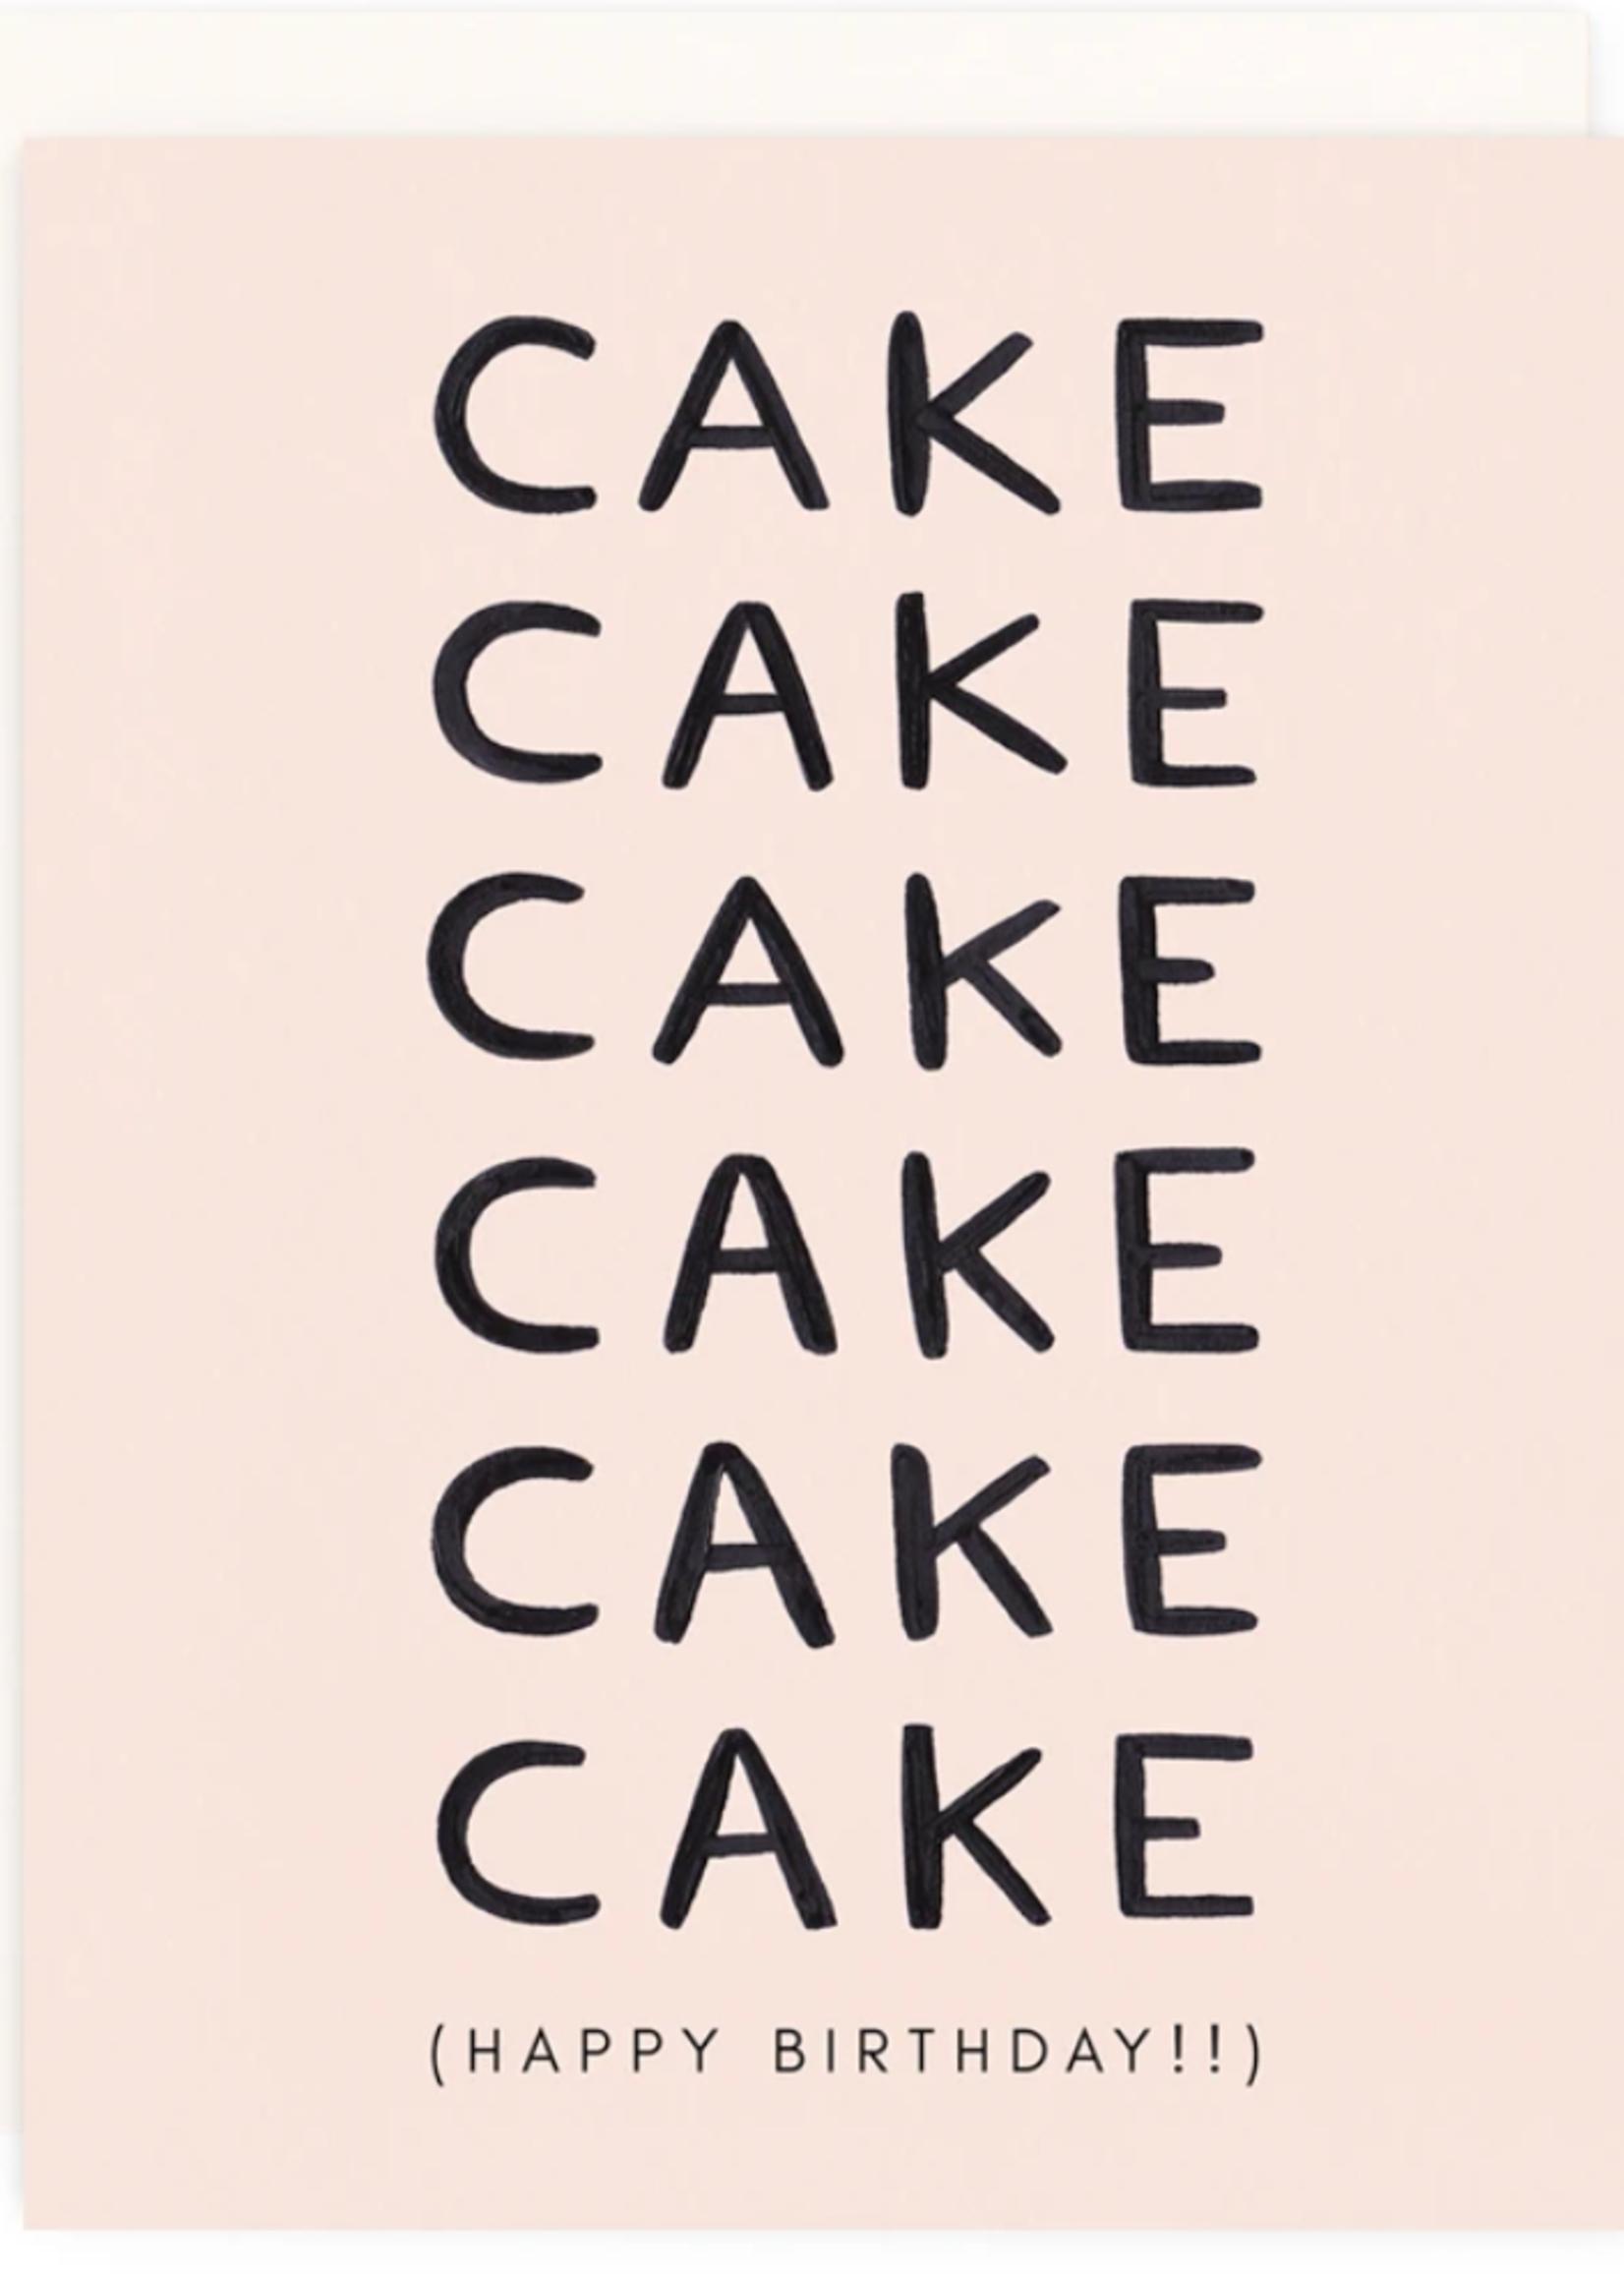 girl w/ knife cake birthday card